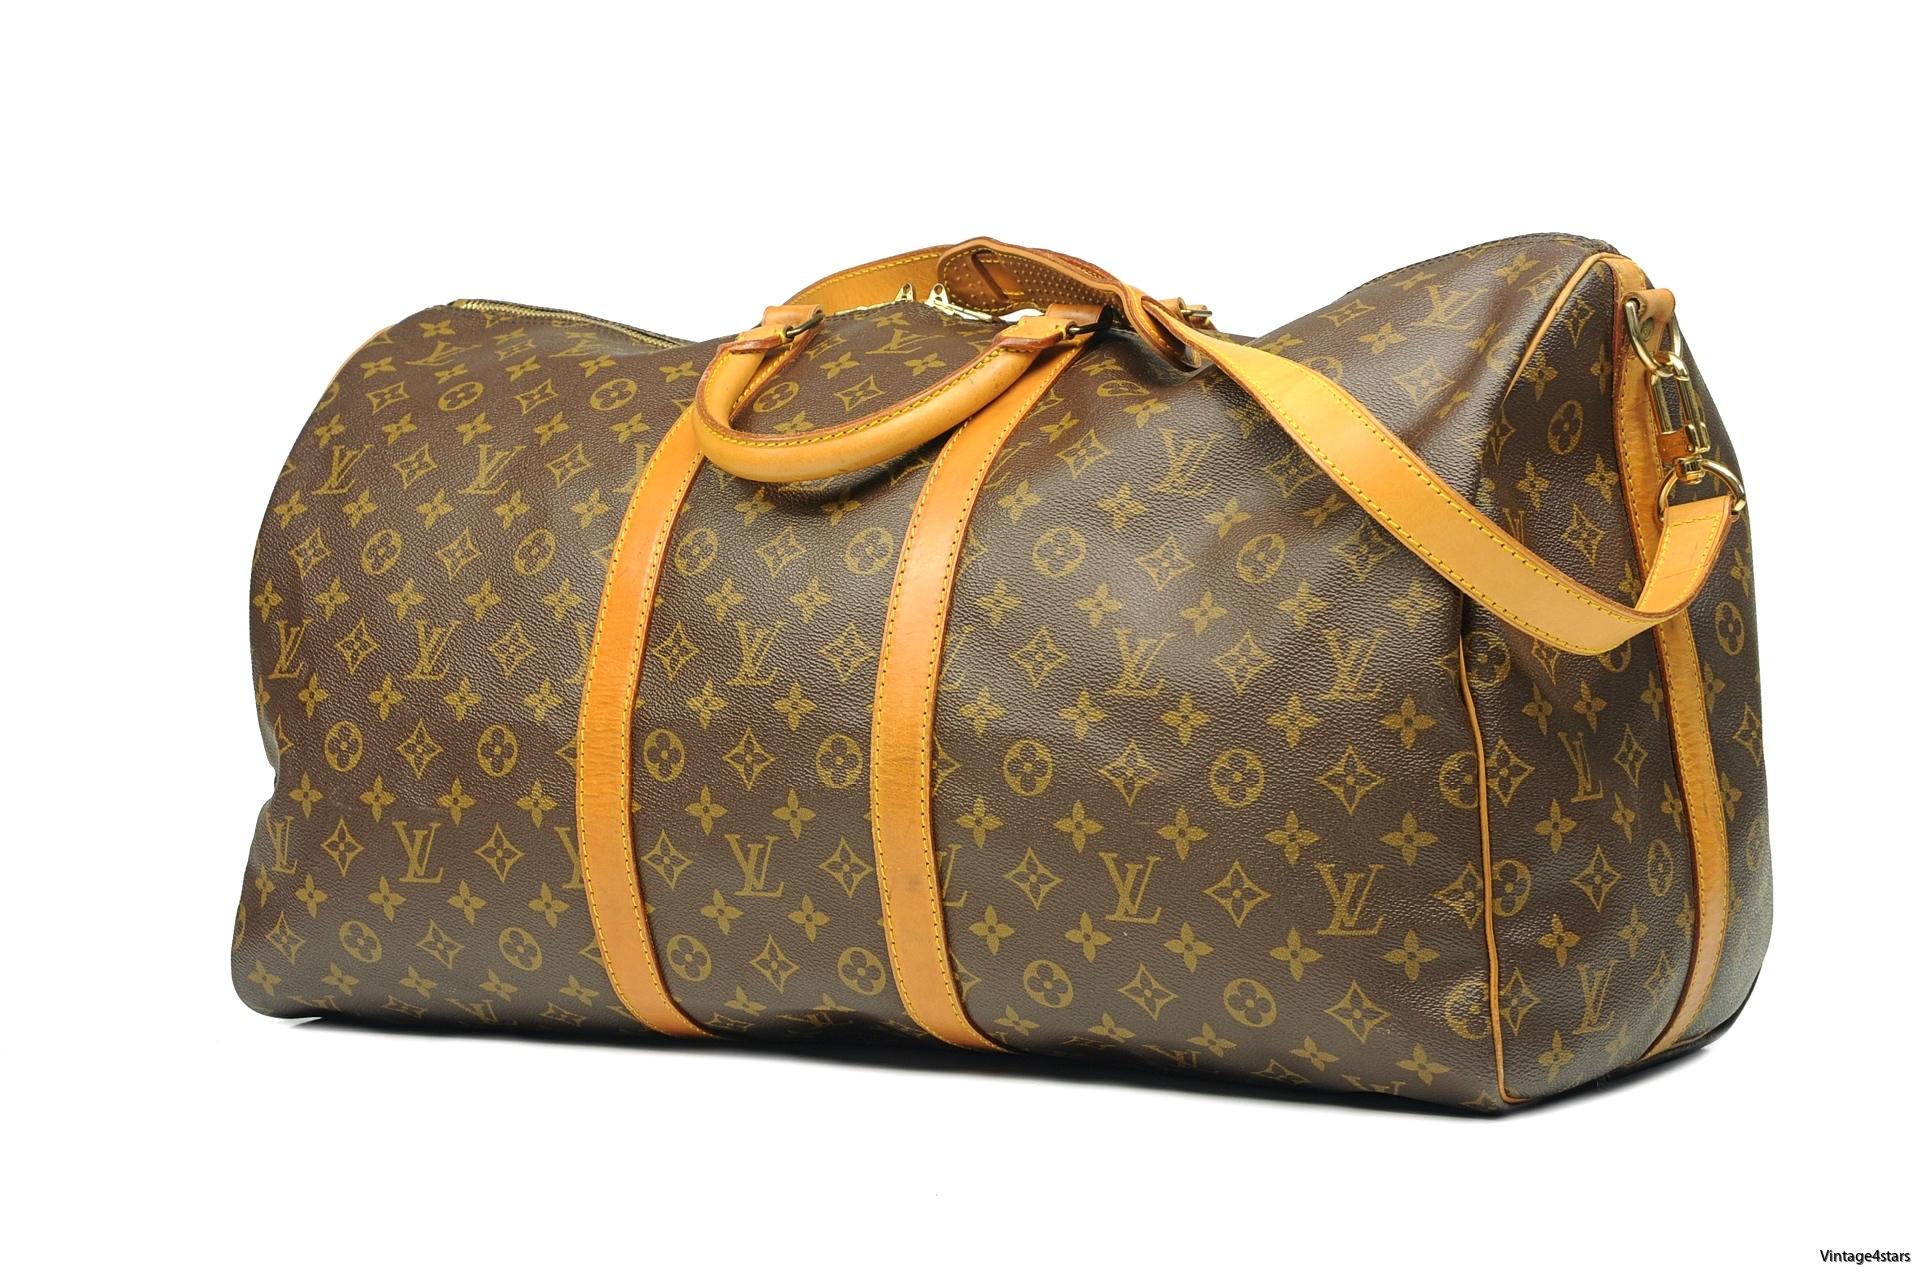 Louis Vuitton Keepall 55 Band 1a-2